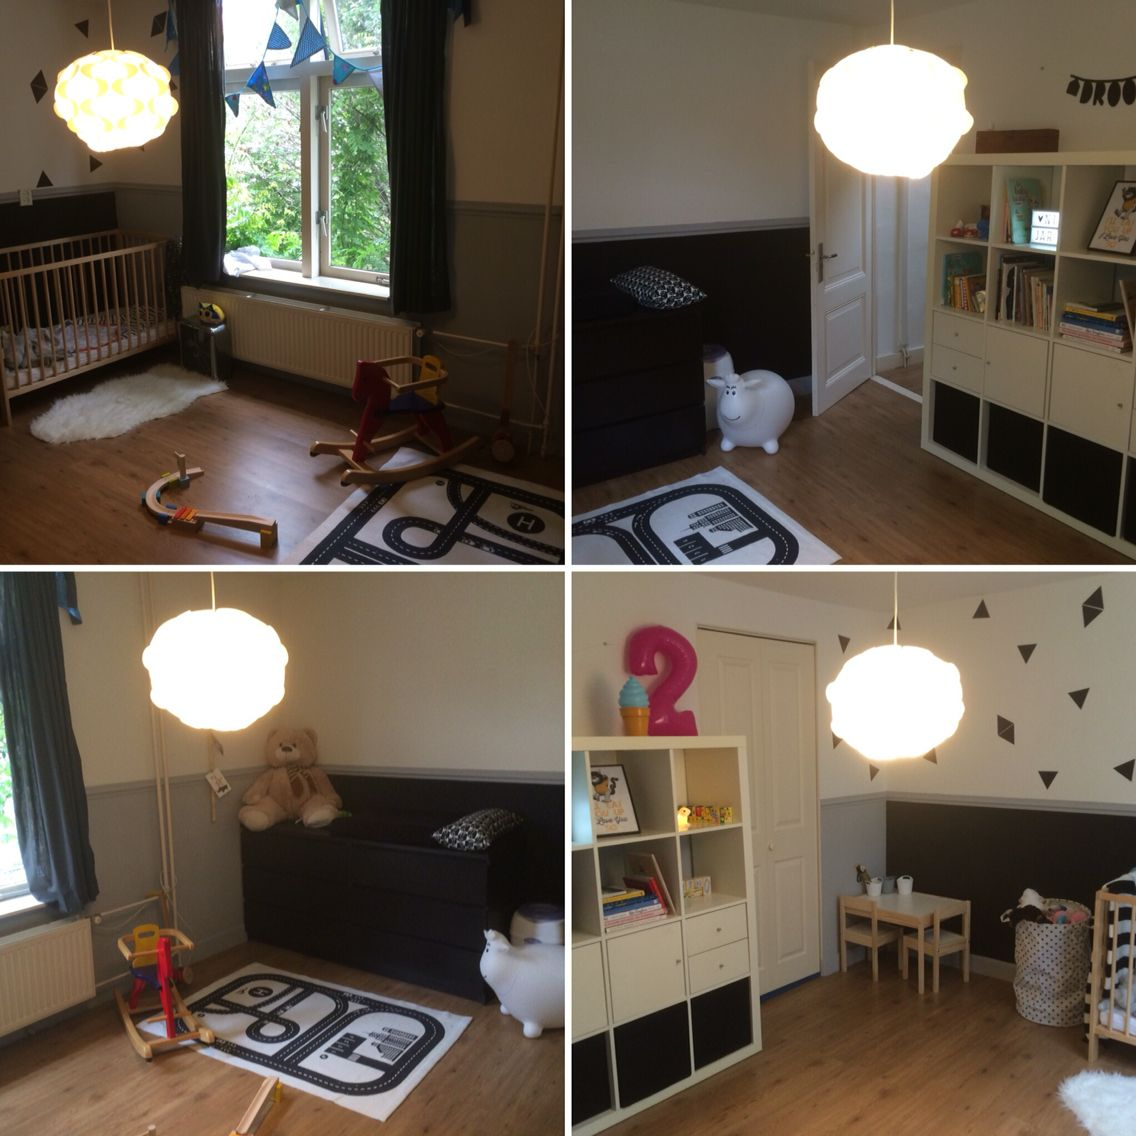 Kinderkamer zwart/wit Ikea